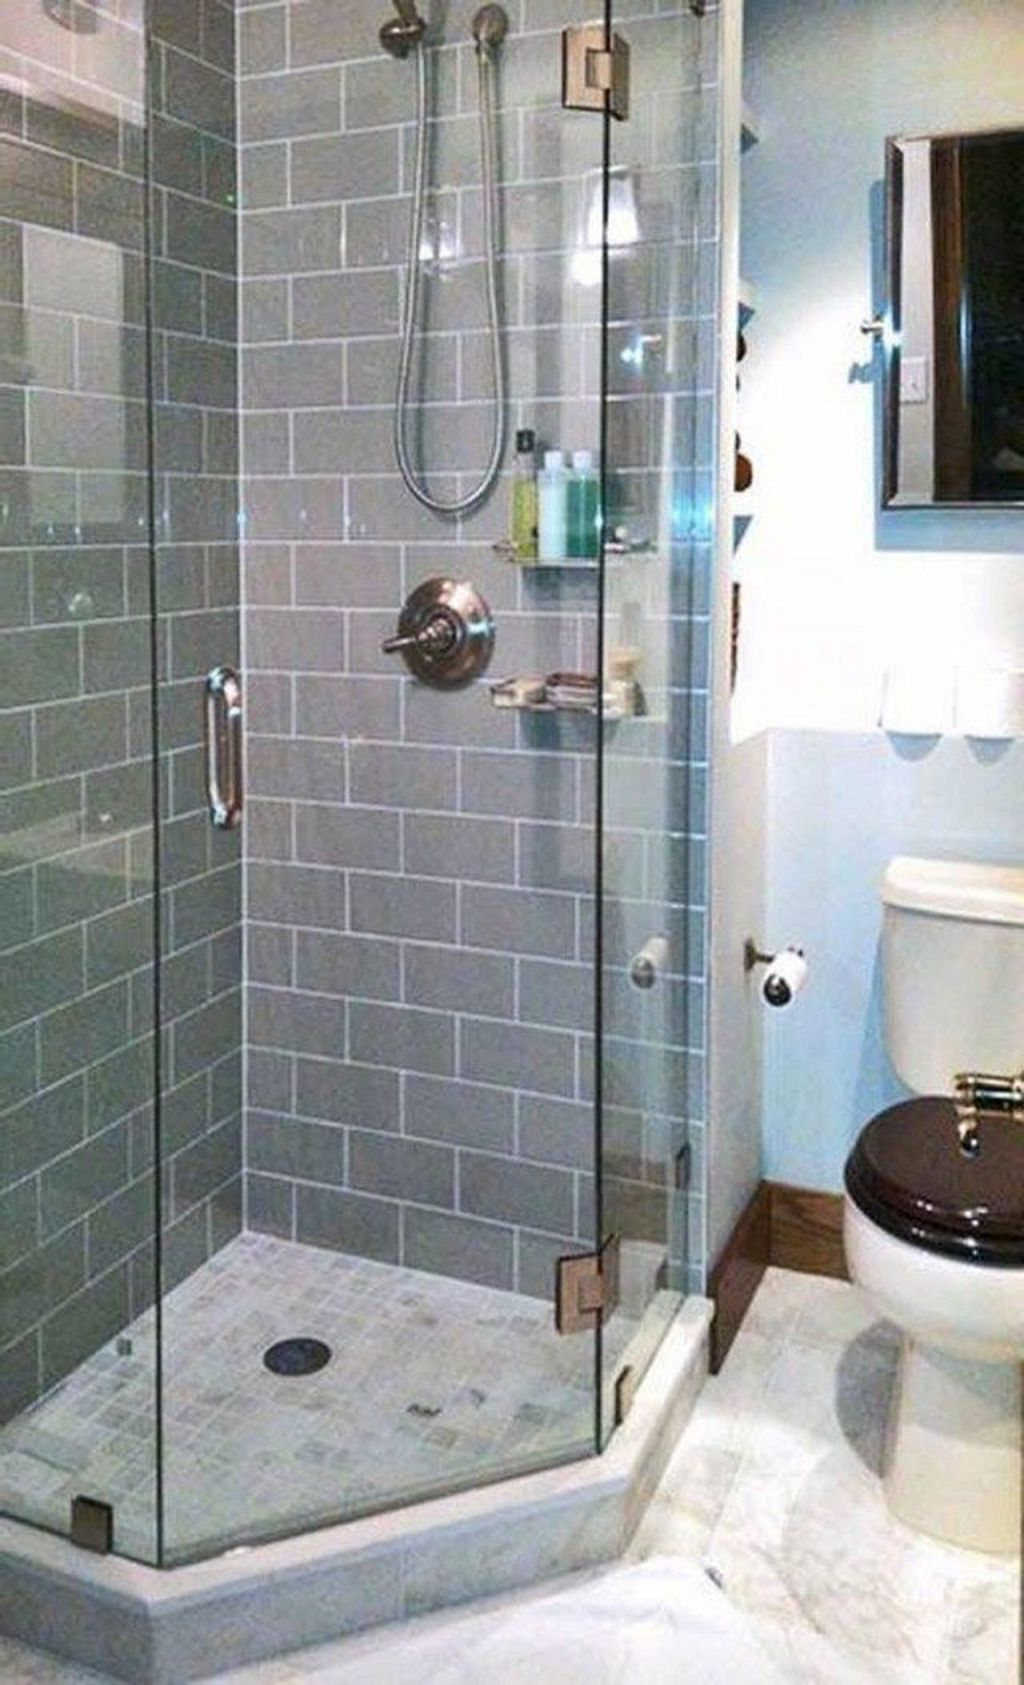 20 Creative Bathroom Design Ideas With Small Space Vannaya